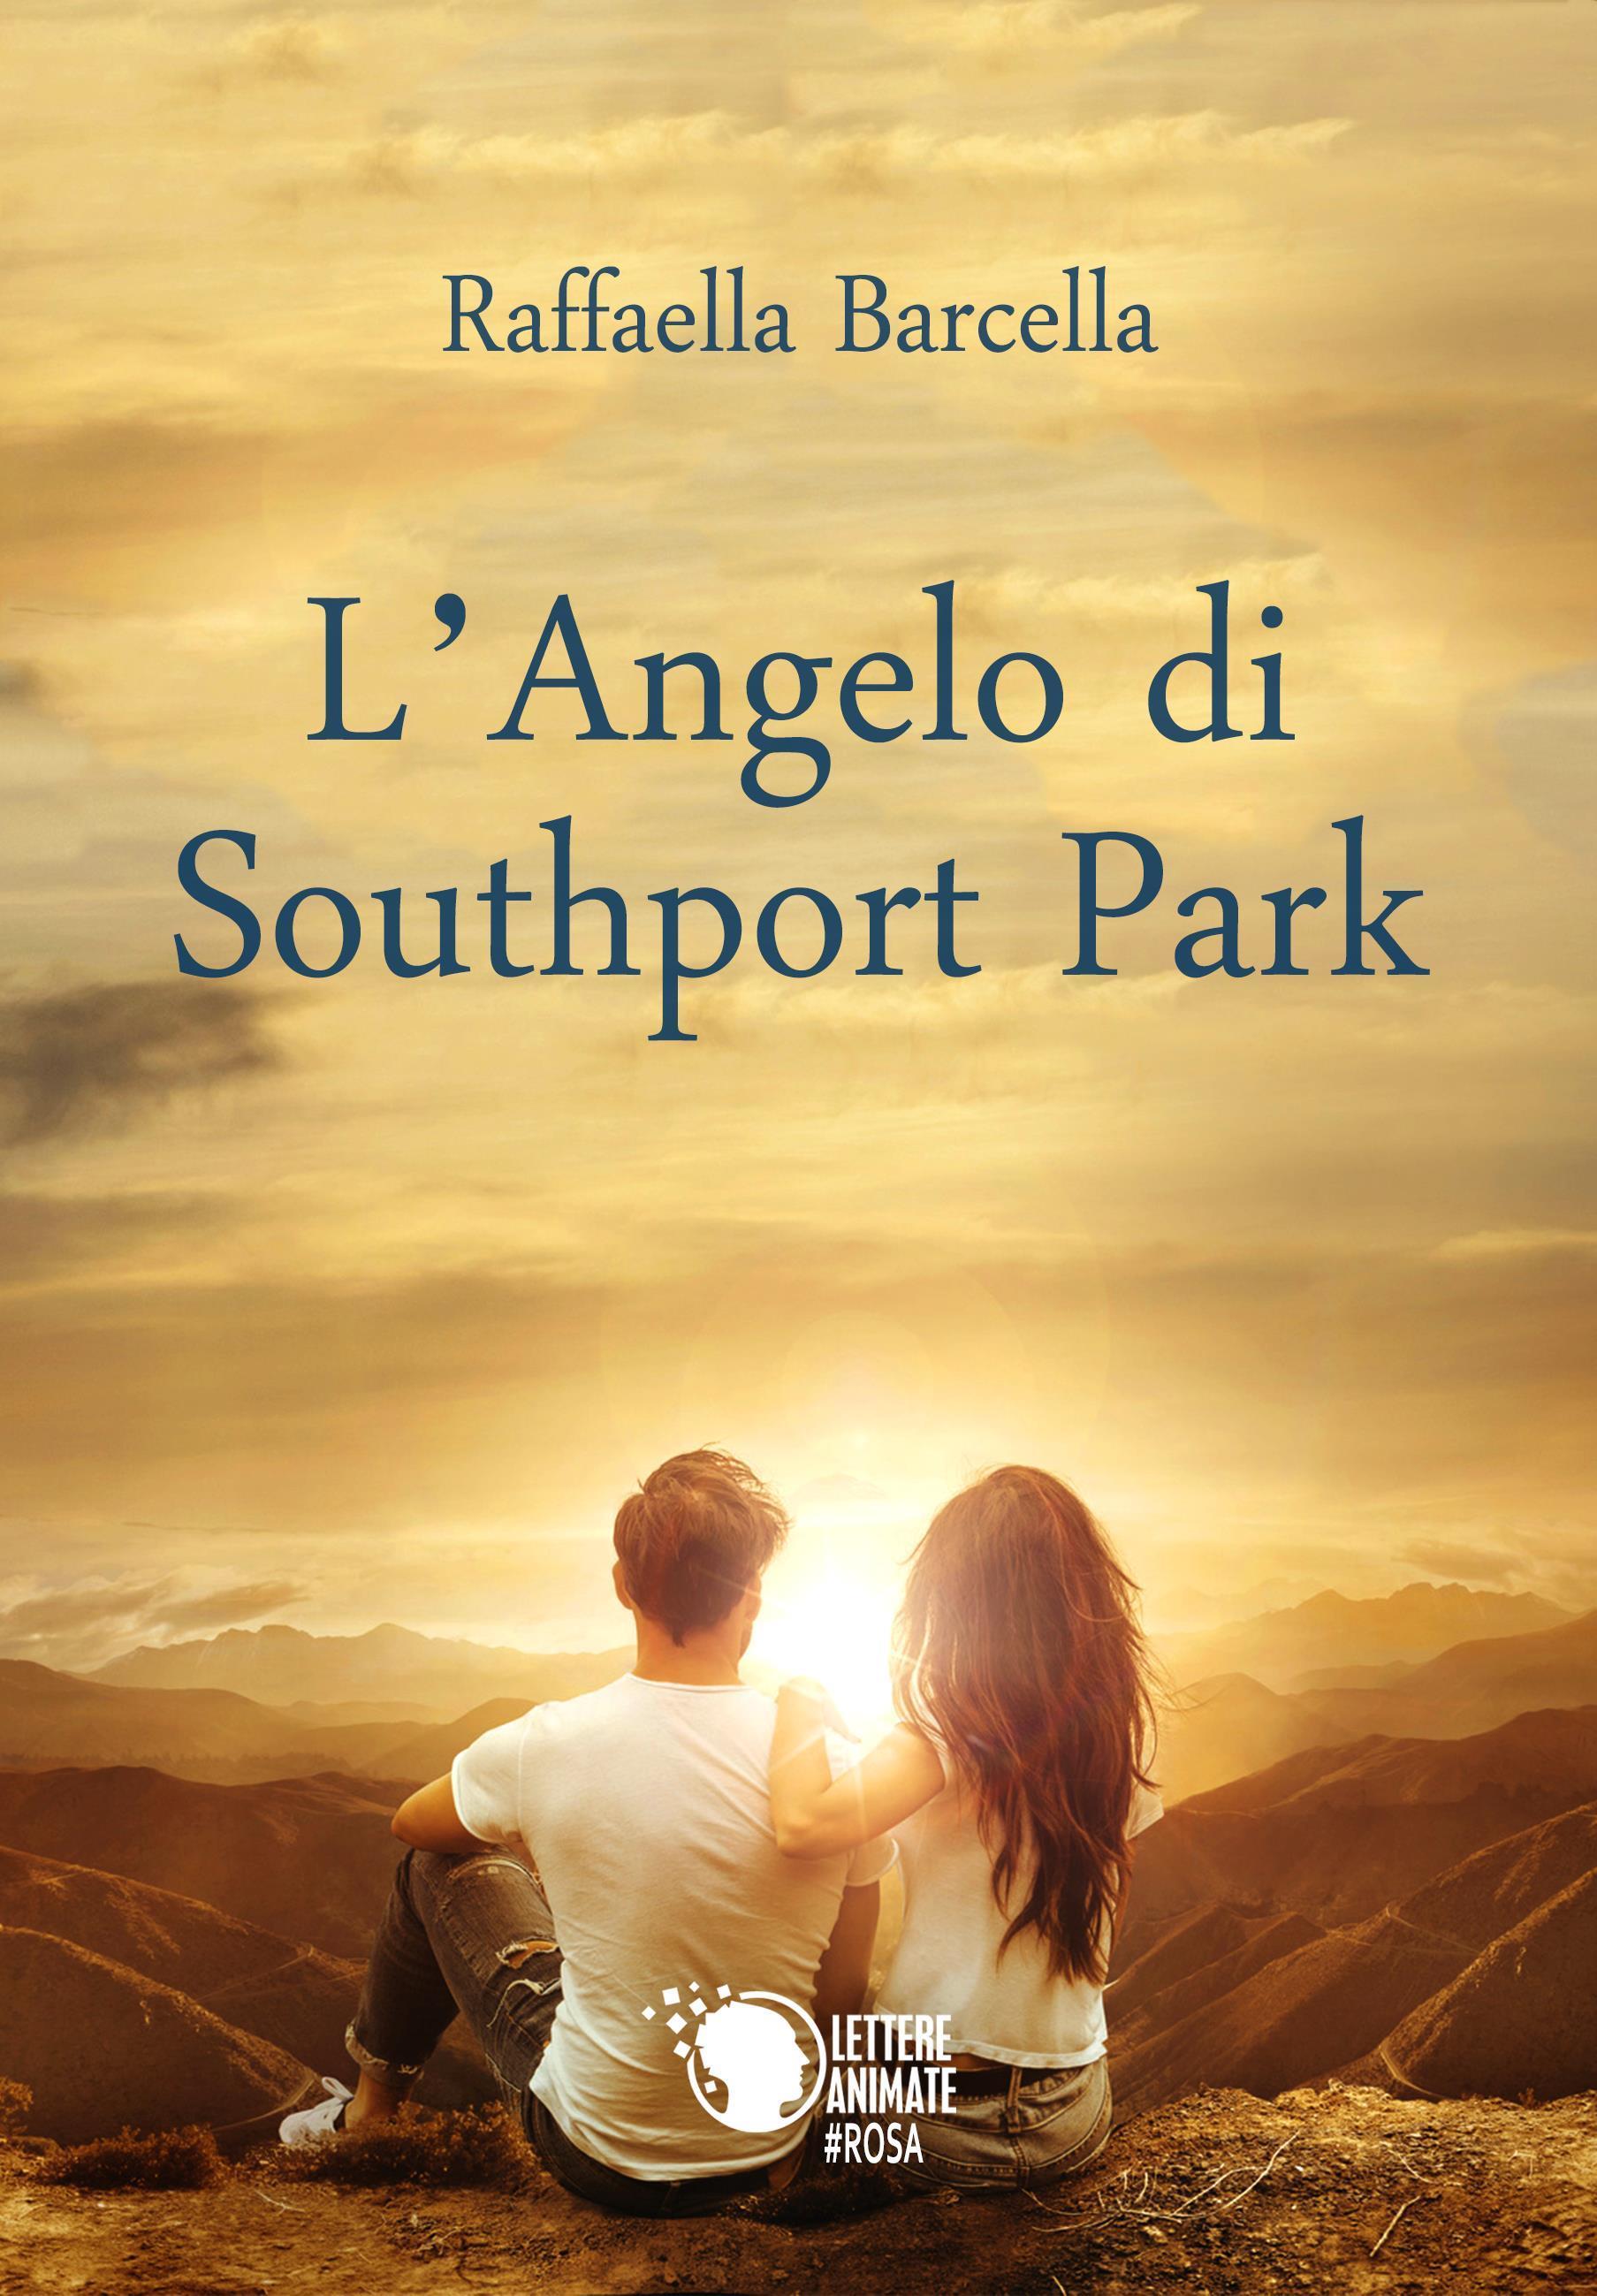 L'angelo di Southport Park